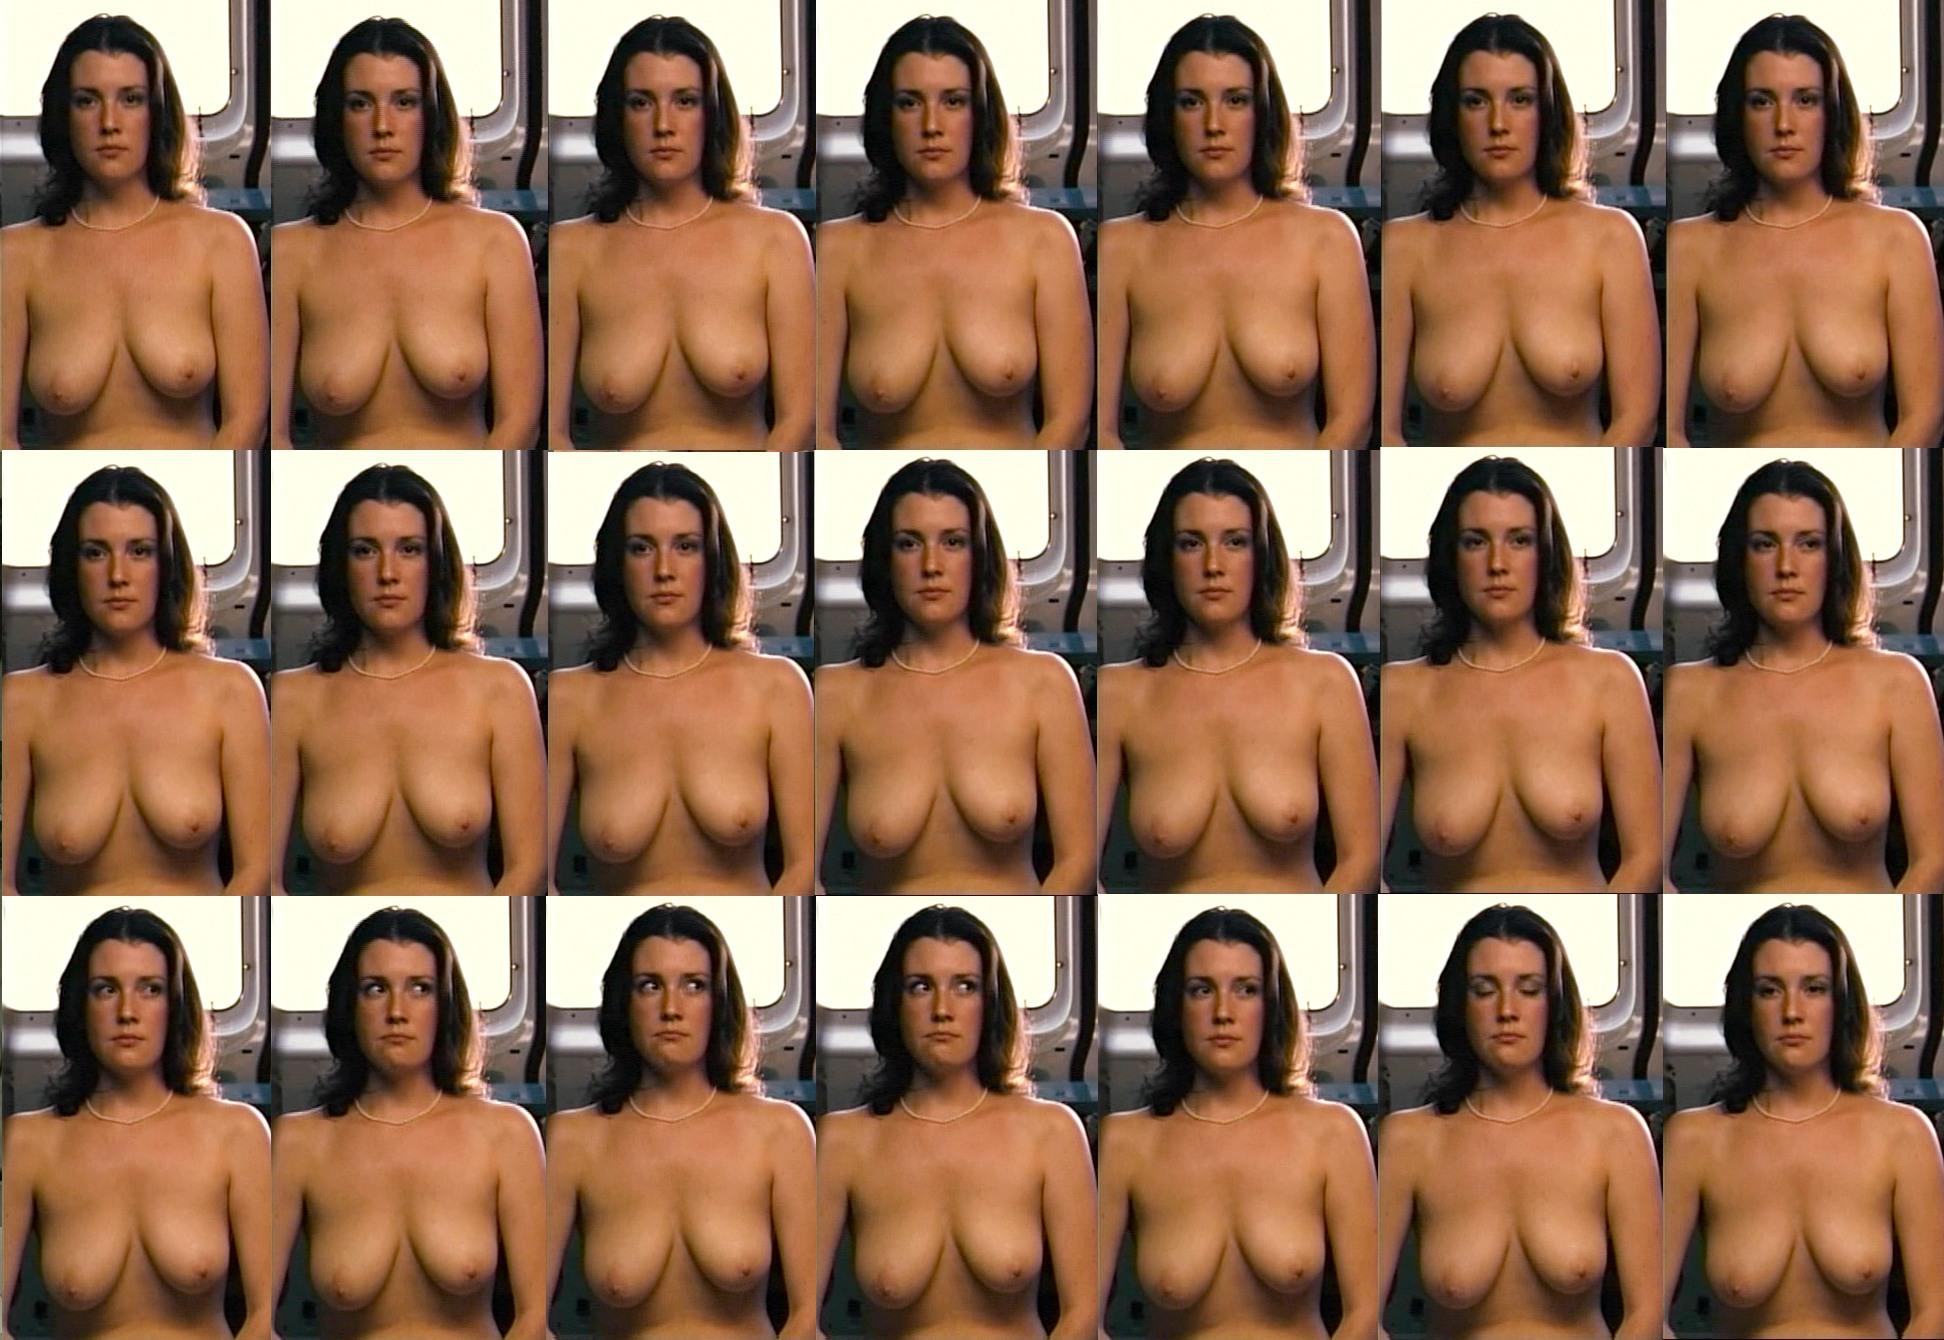 Melanie lynskey hot porn pics